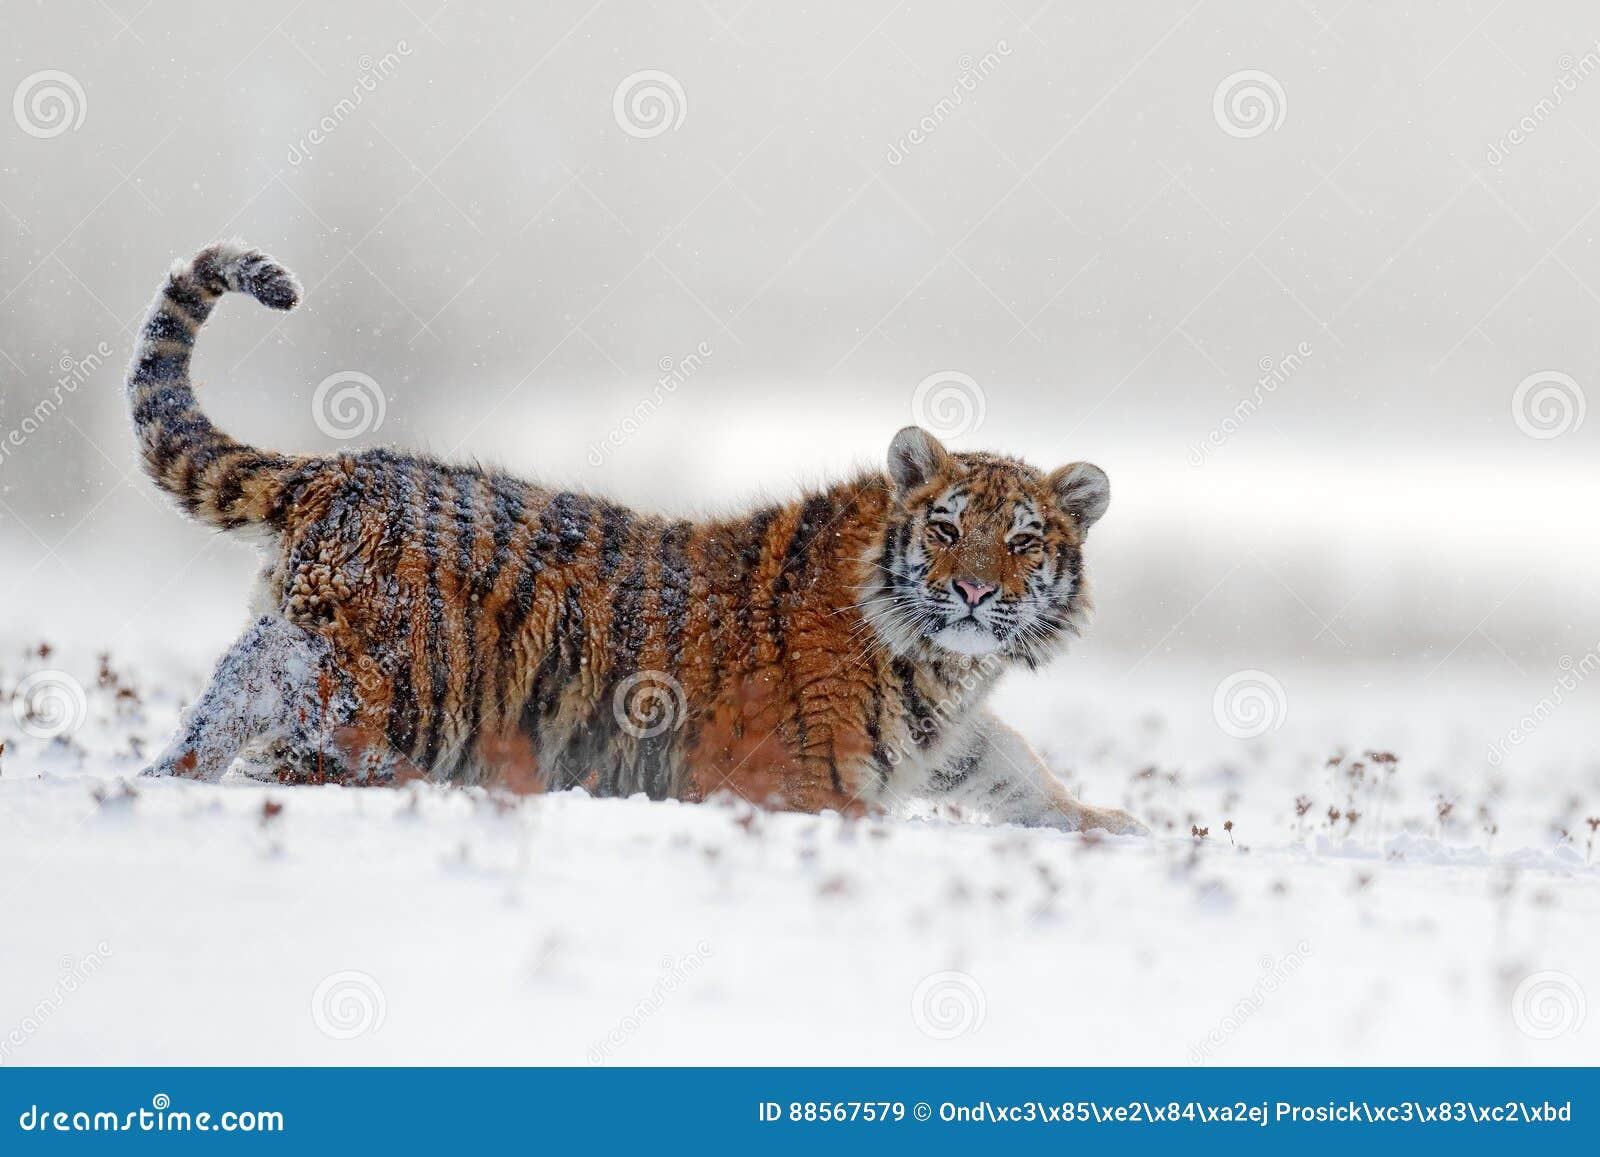 Olhar fixado cara do tigre Tigre Siberian na queda da neve Tigre de Amur que corre na neve Cena do inverno dos animais selvagens